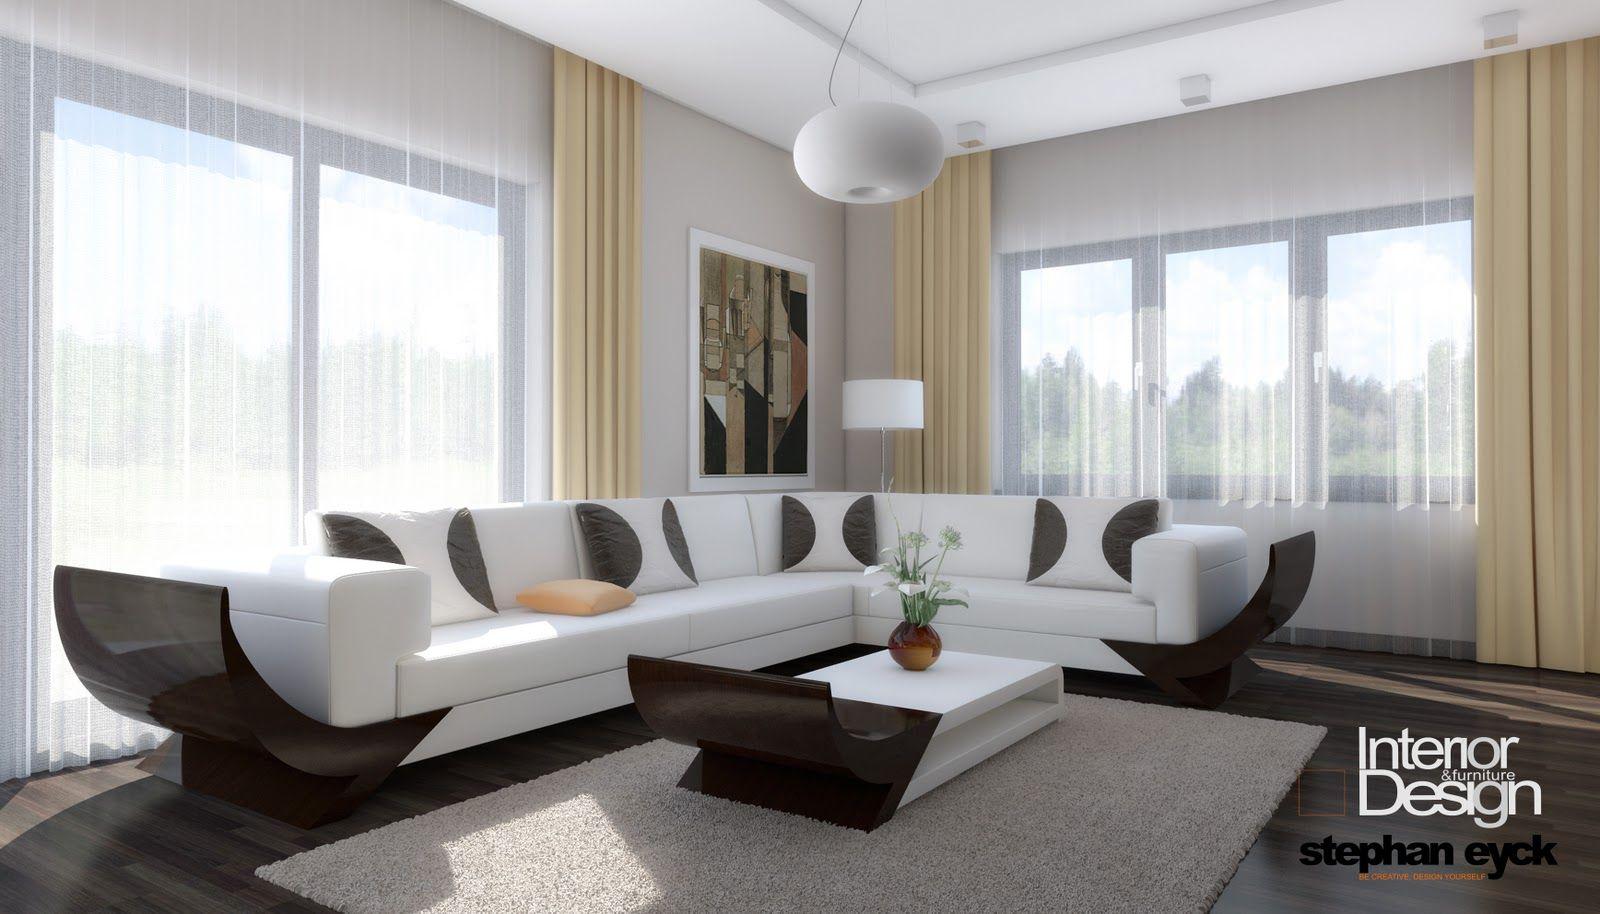 interior design | stephan eyck design interior: design interior